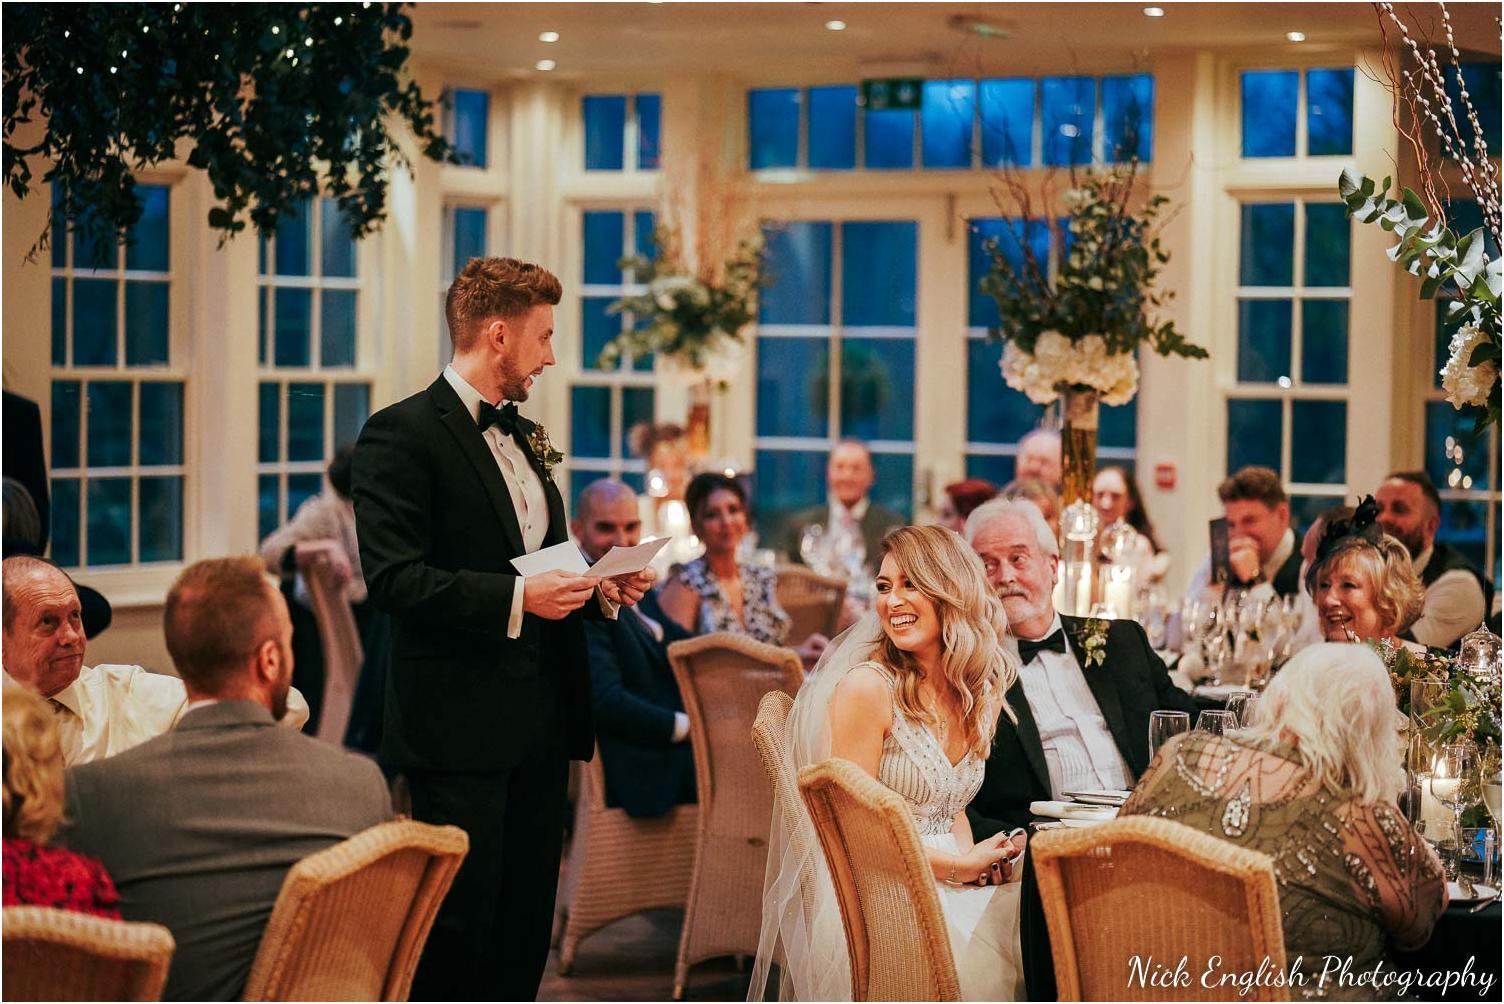 Mitton_Hall_Christmas_Winter_Wedding-69.jpg